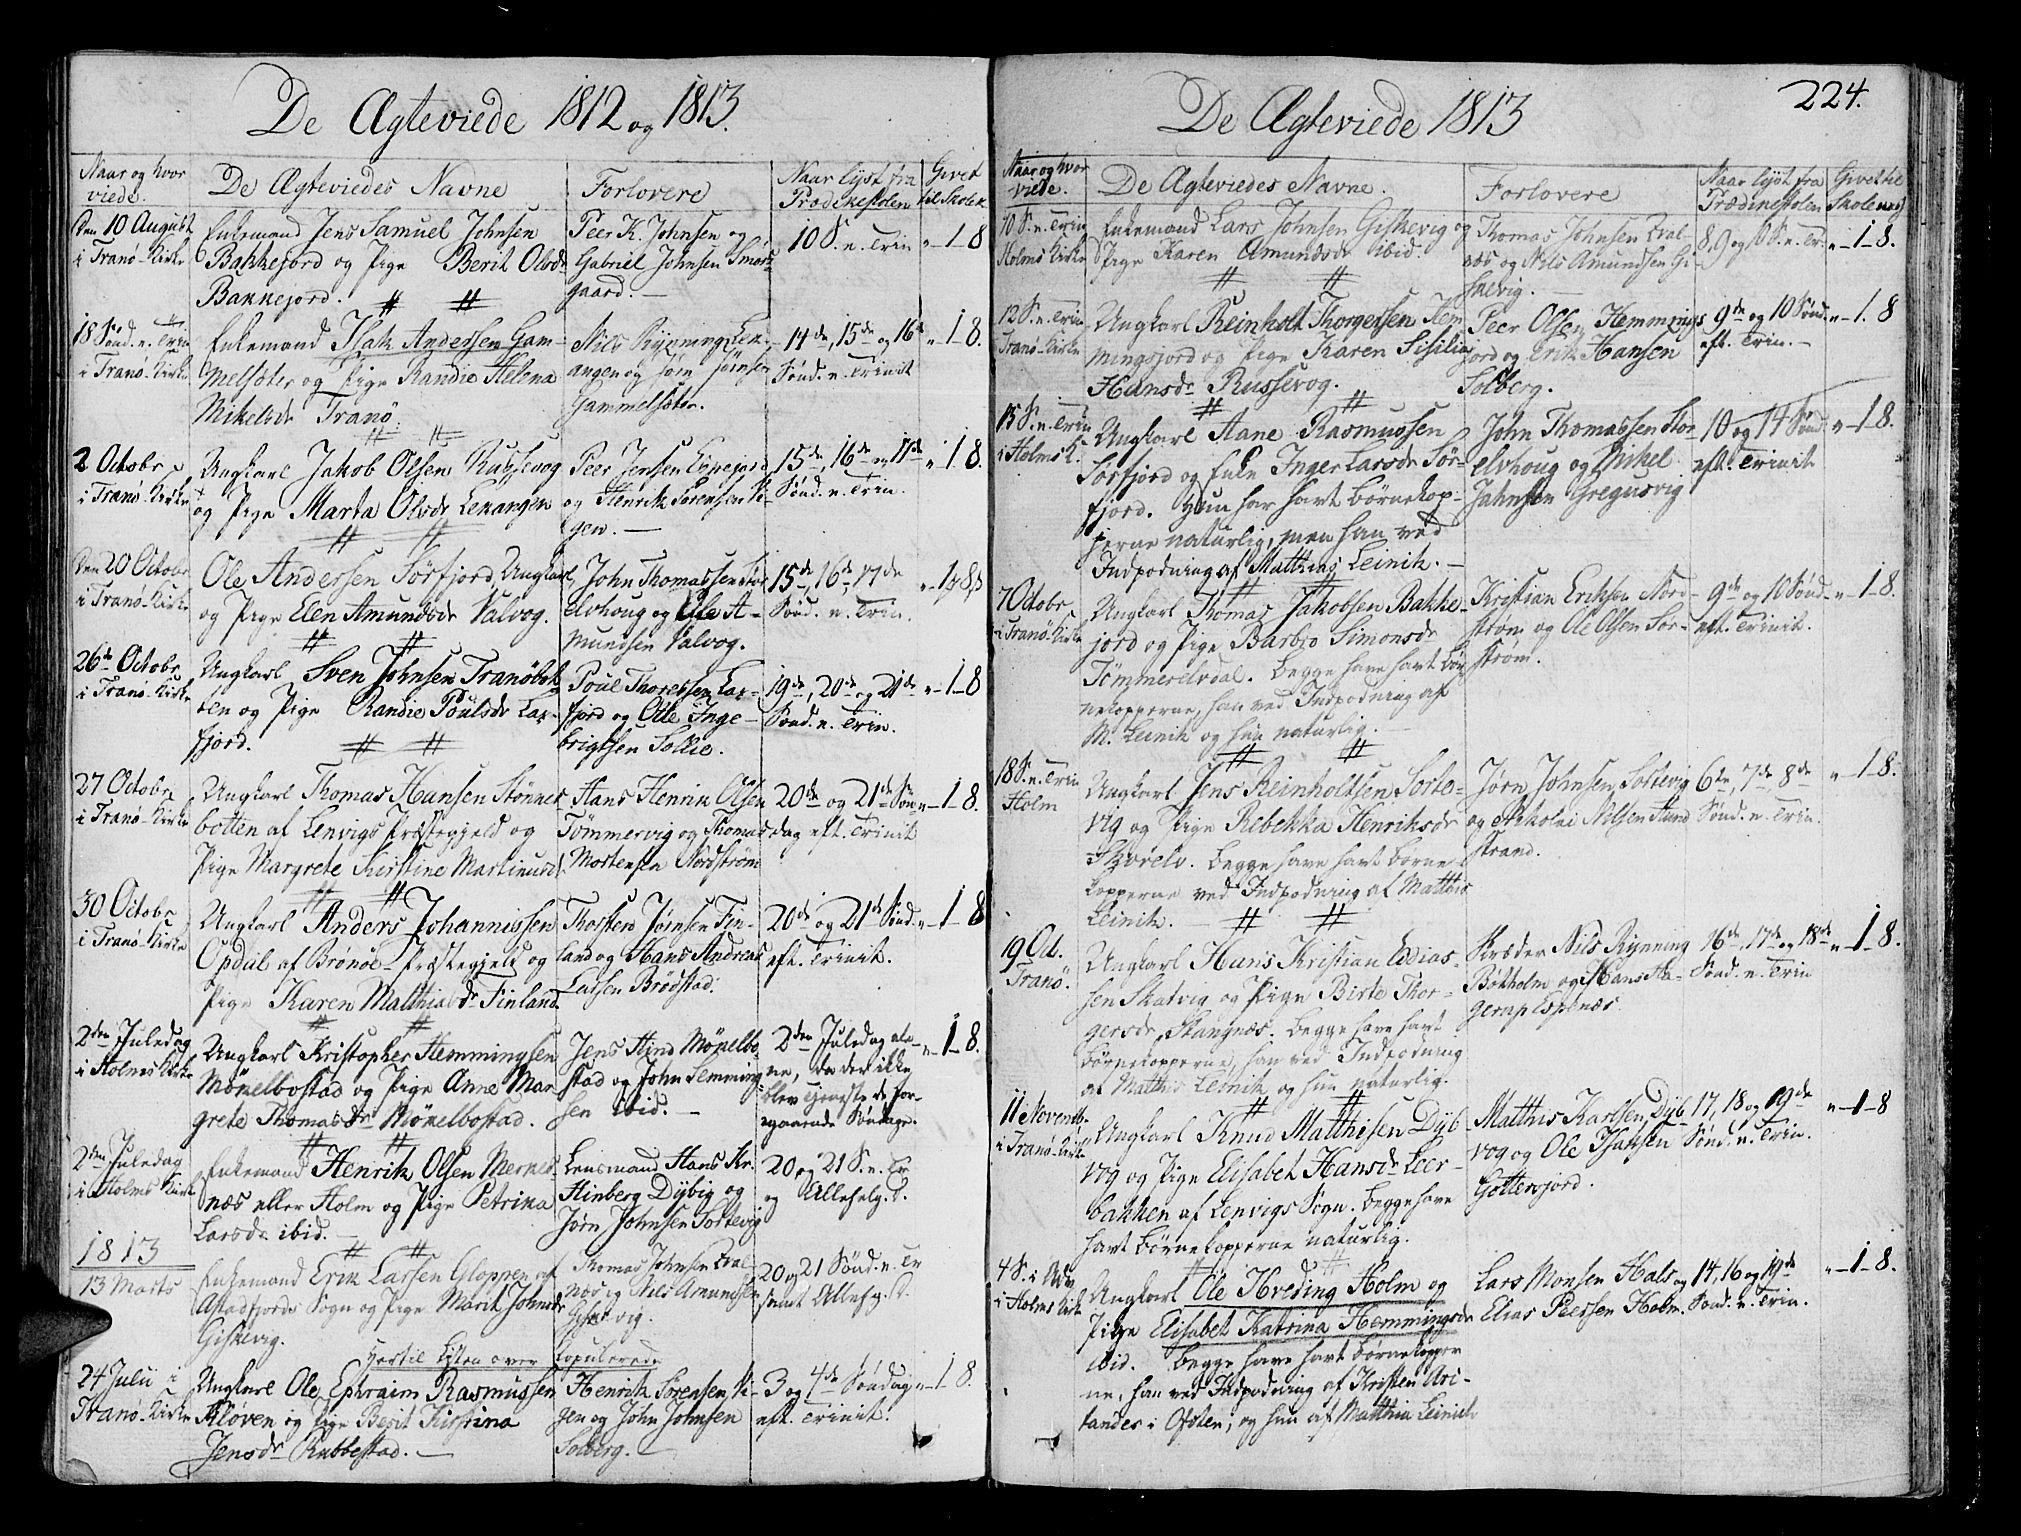 SATØ, Tranøy sokneprestkontor, I/Ia/Iaa/L0003kirke: Ministerialbok nr. 3, 1807-1820, s. 224